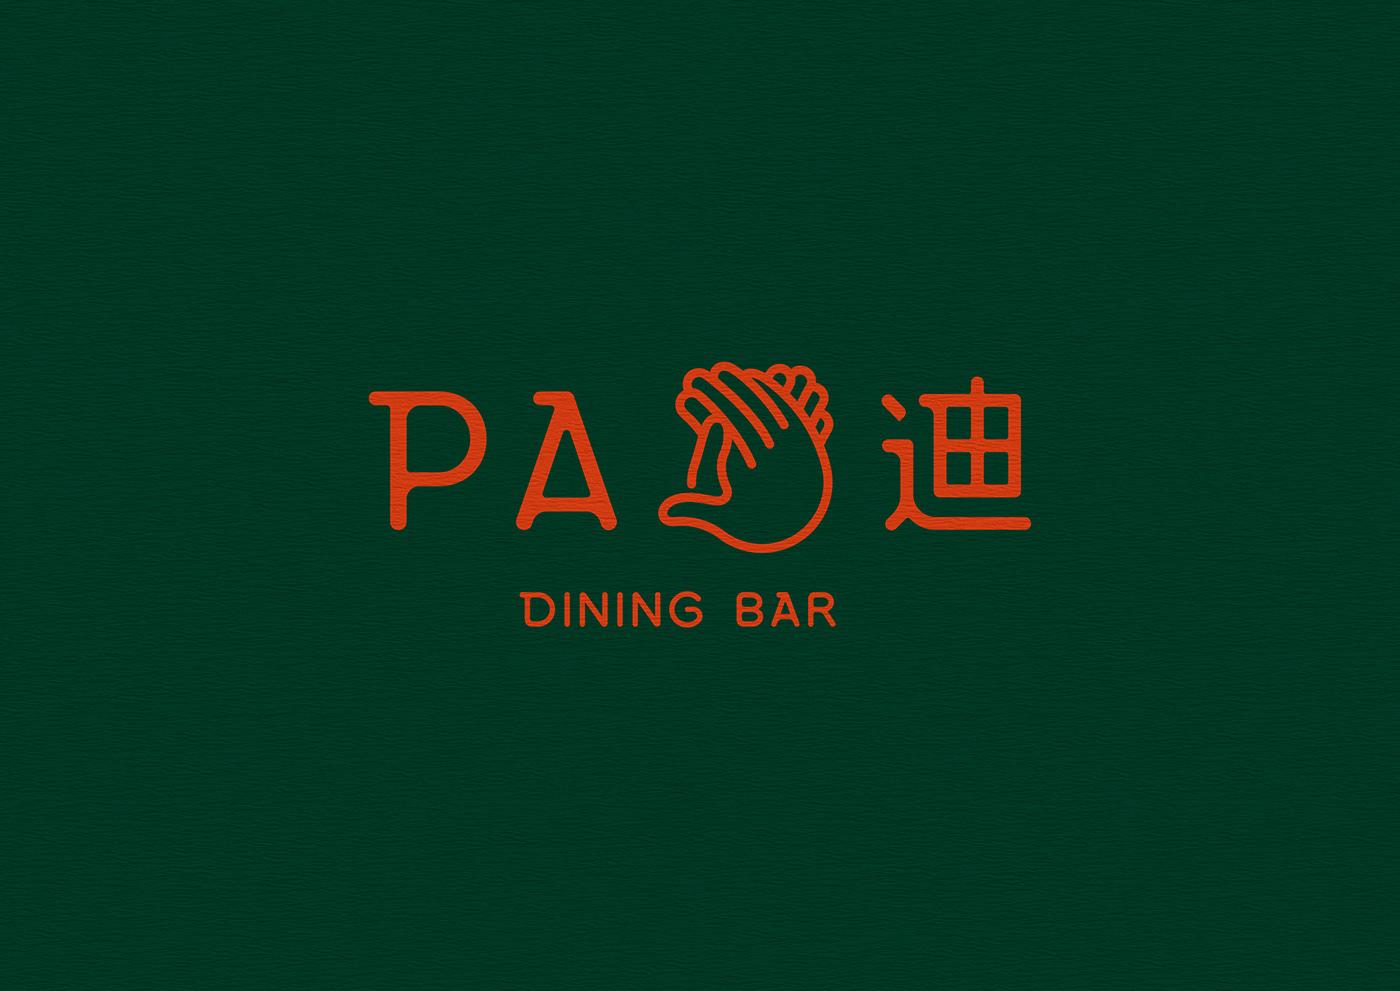 bar branding  graphic design  ILLUSTRATION  logo Macao macao design poster restaurant untitled macao